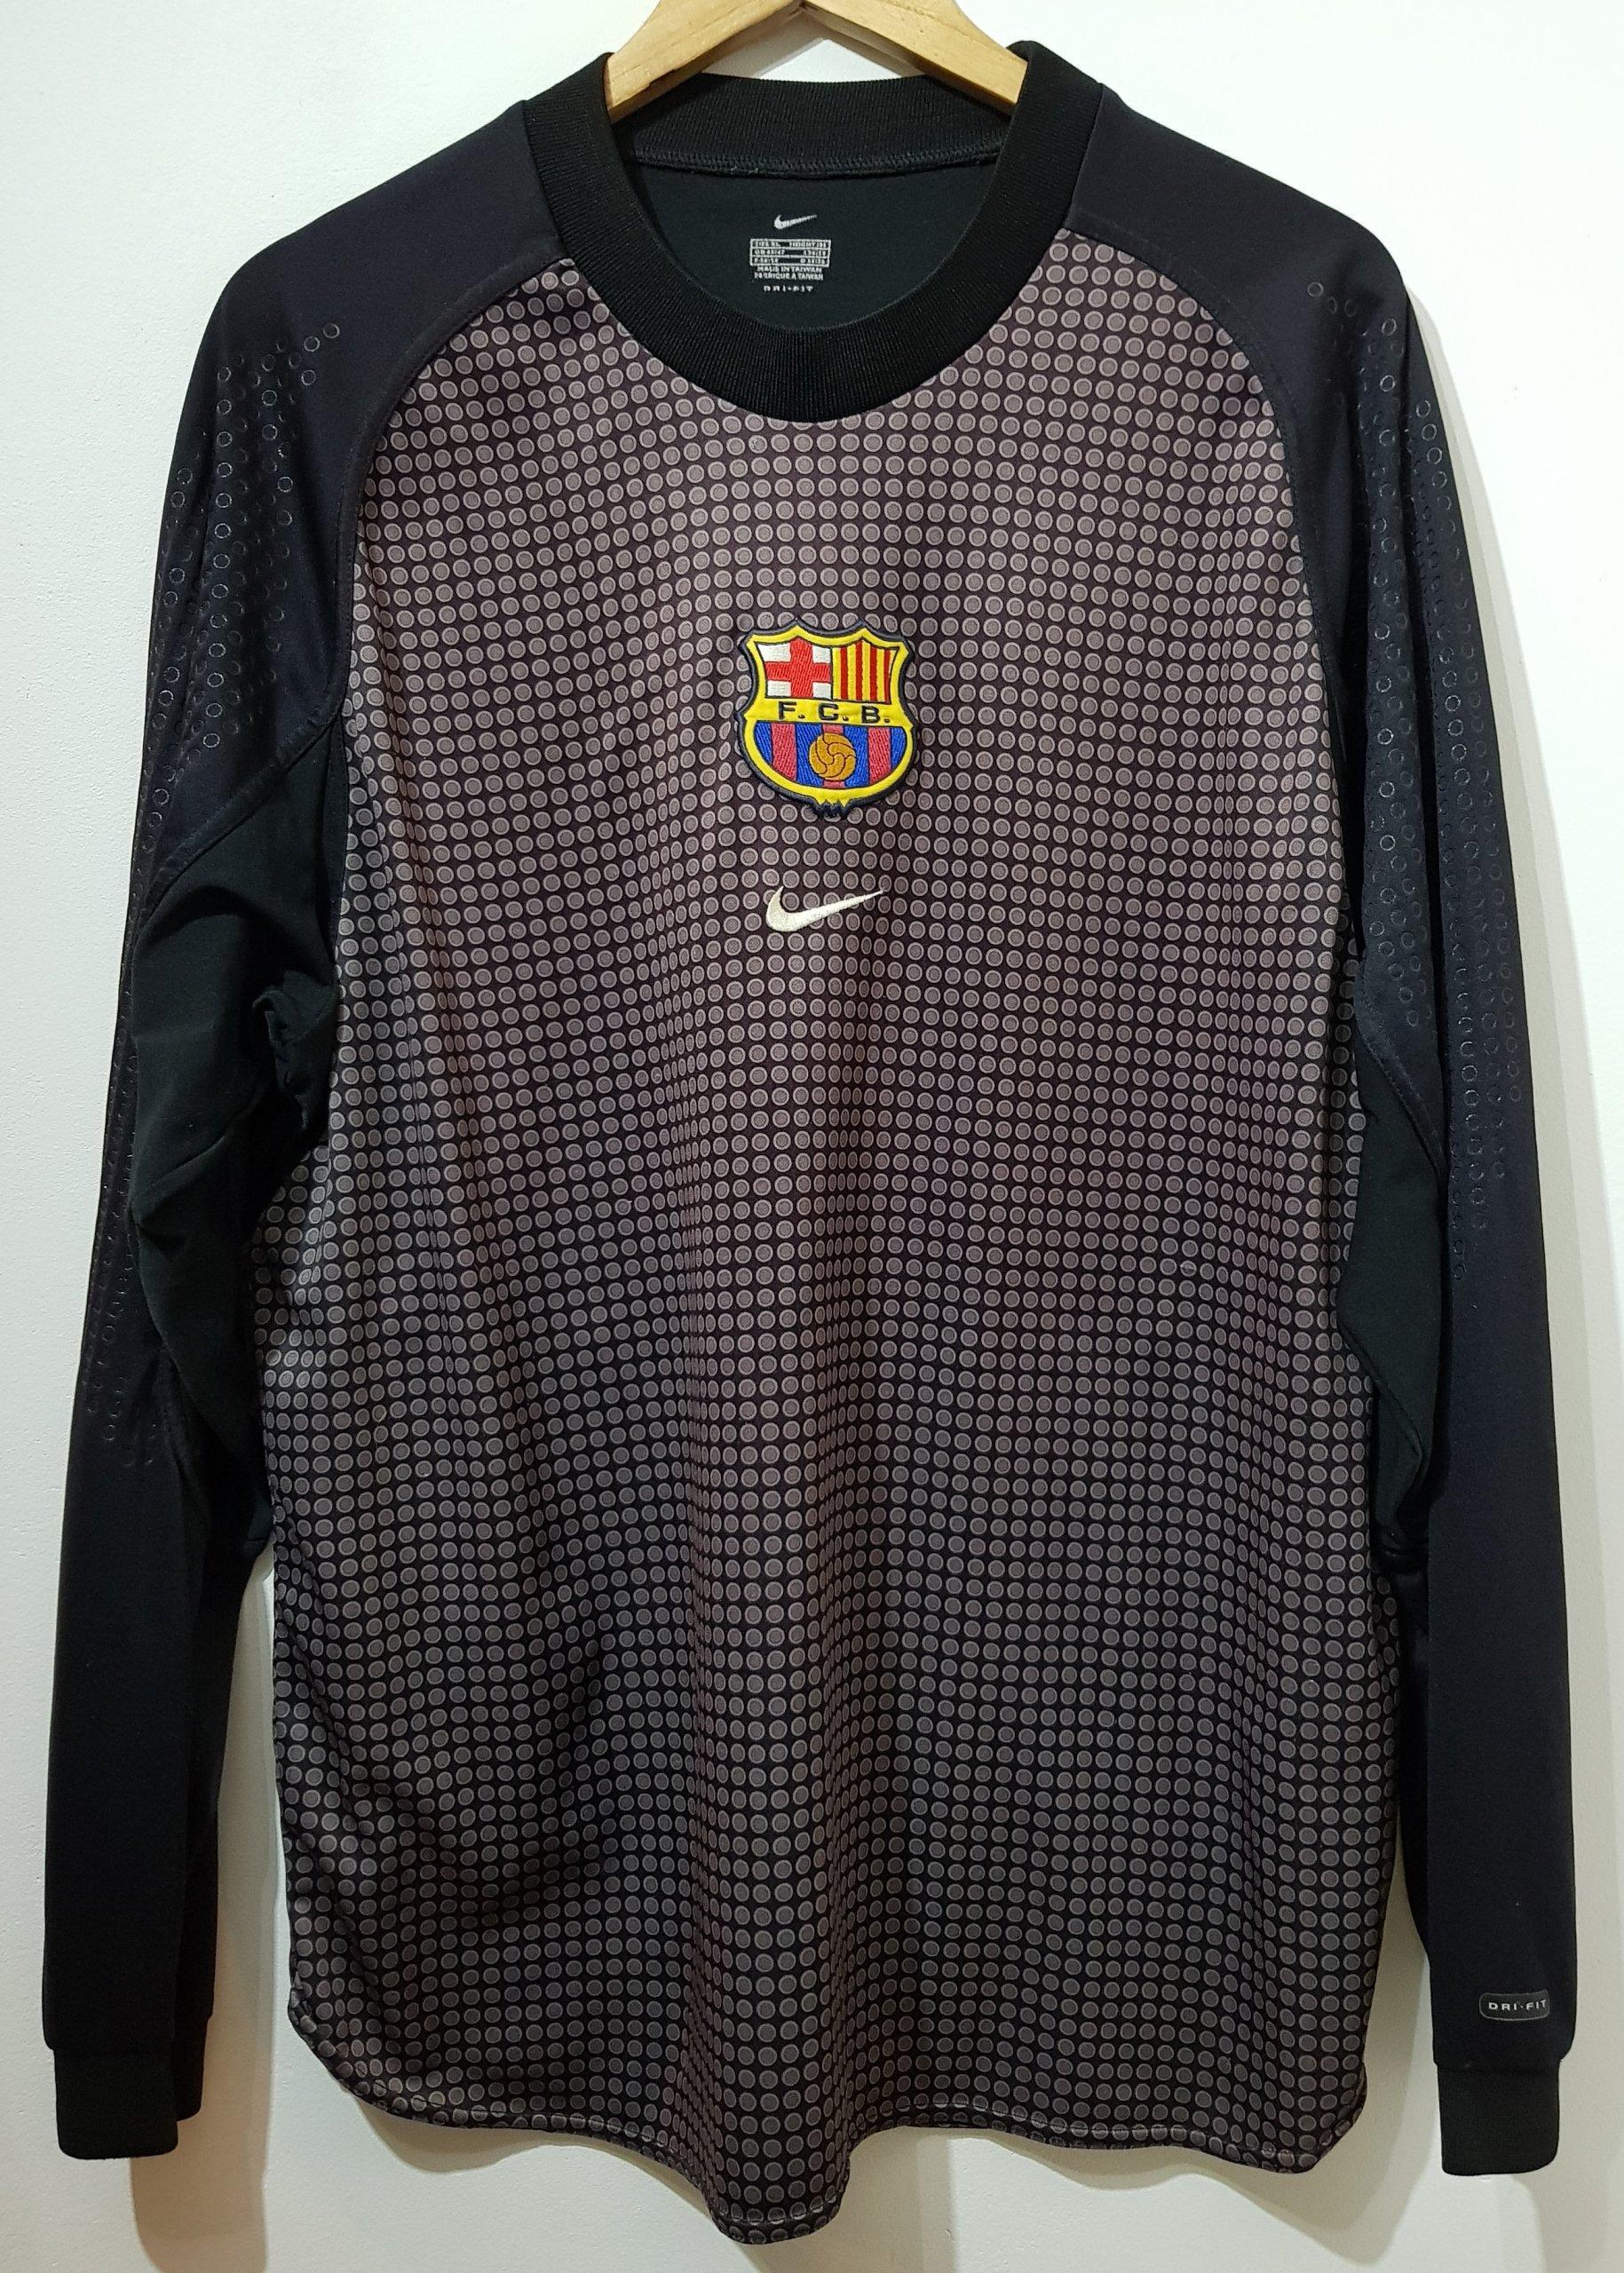 c6dea0bdd Koszulka Retro FC Barcelona bramkarska - 7290237221 - oficjalne ...